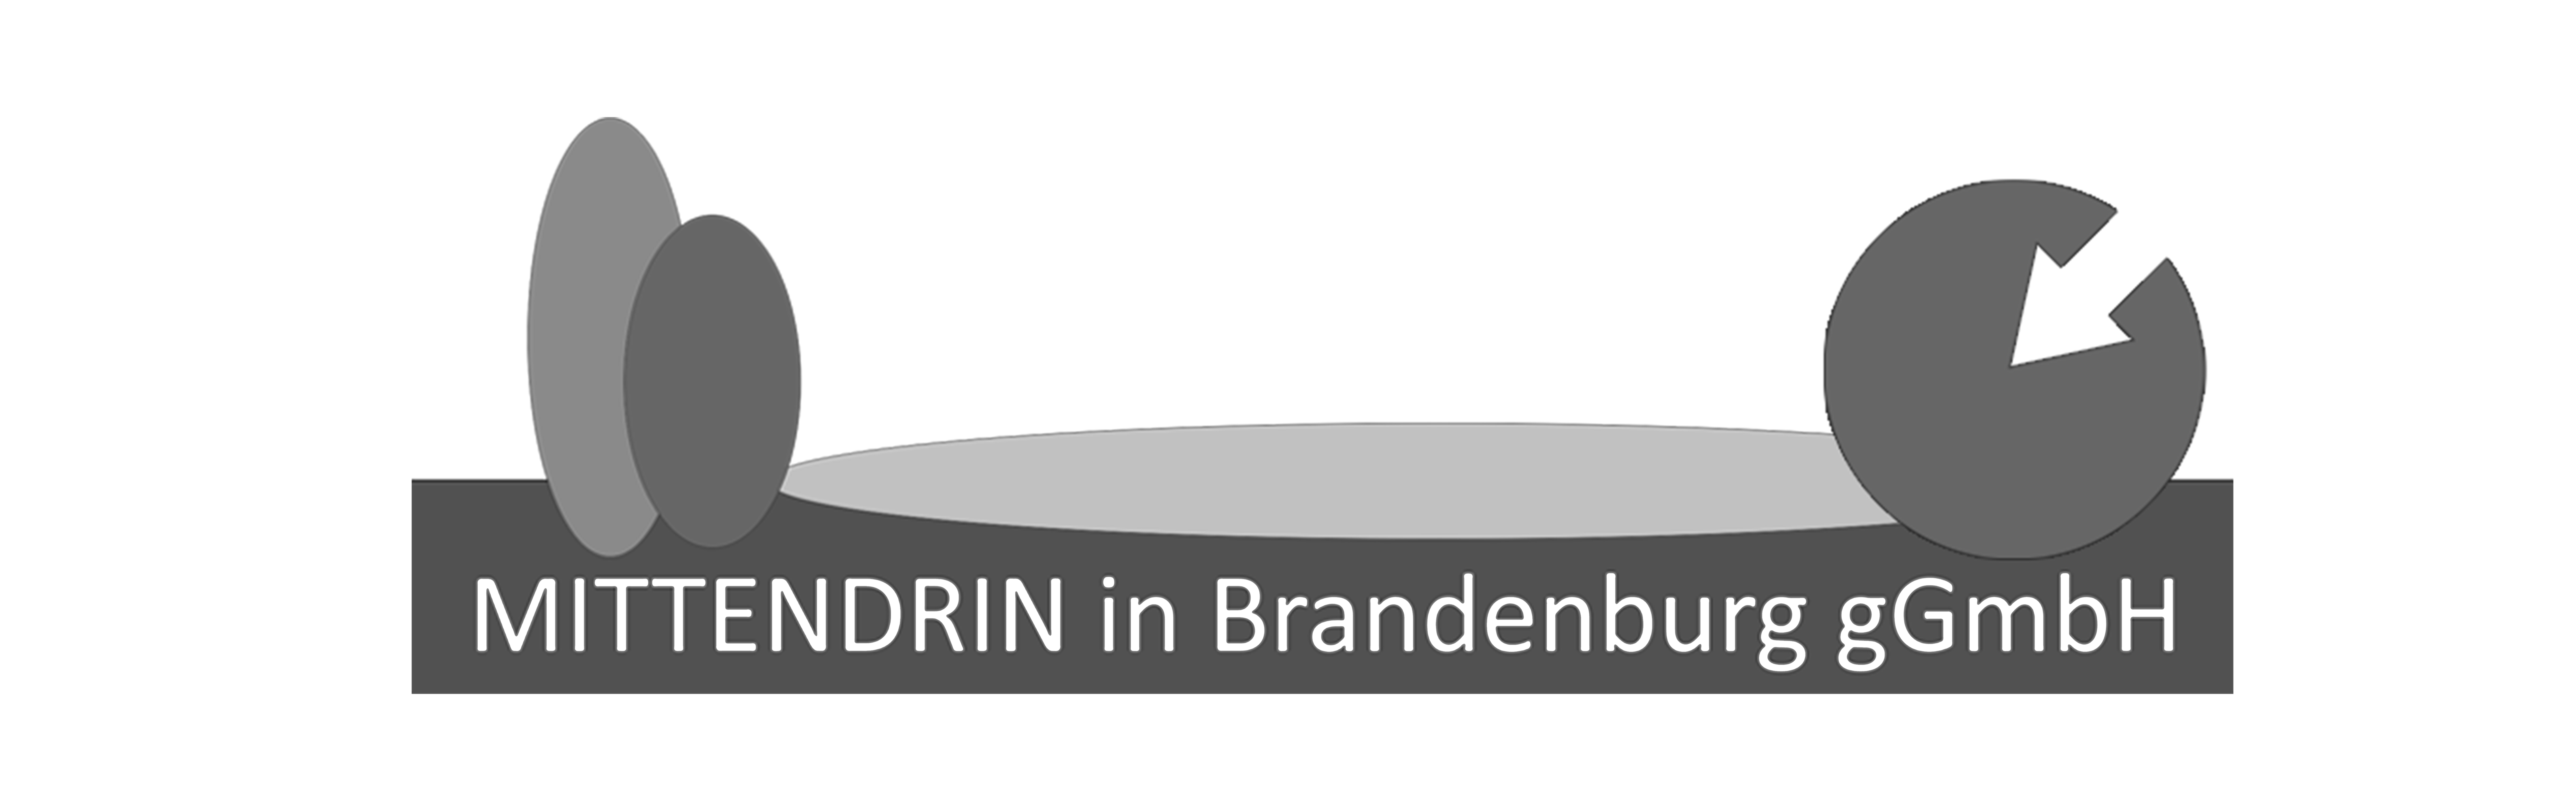 Logo Mittendrin in Brandenburg gGmbH